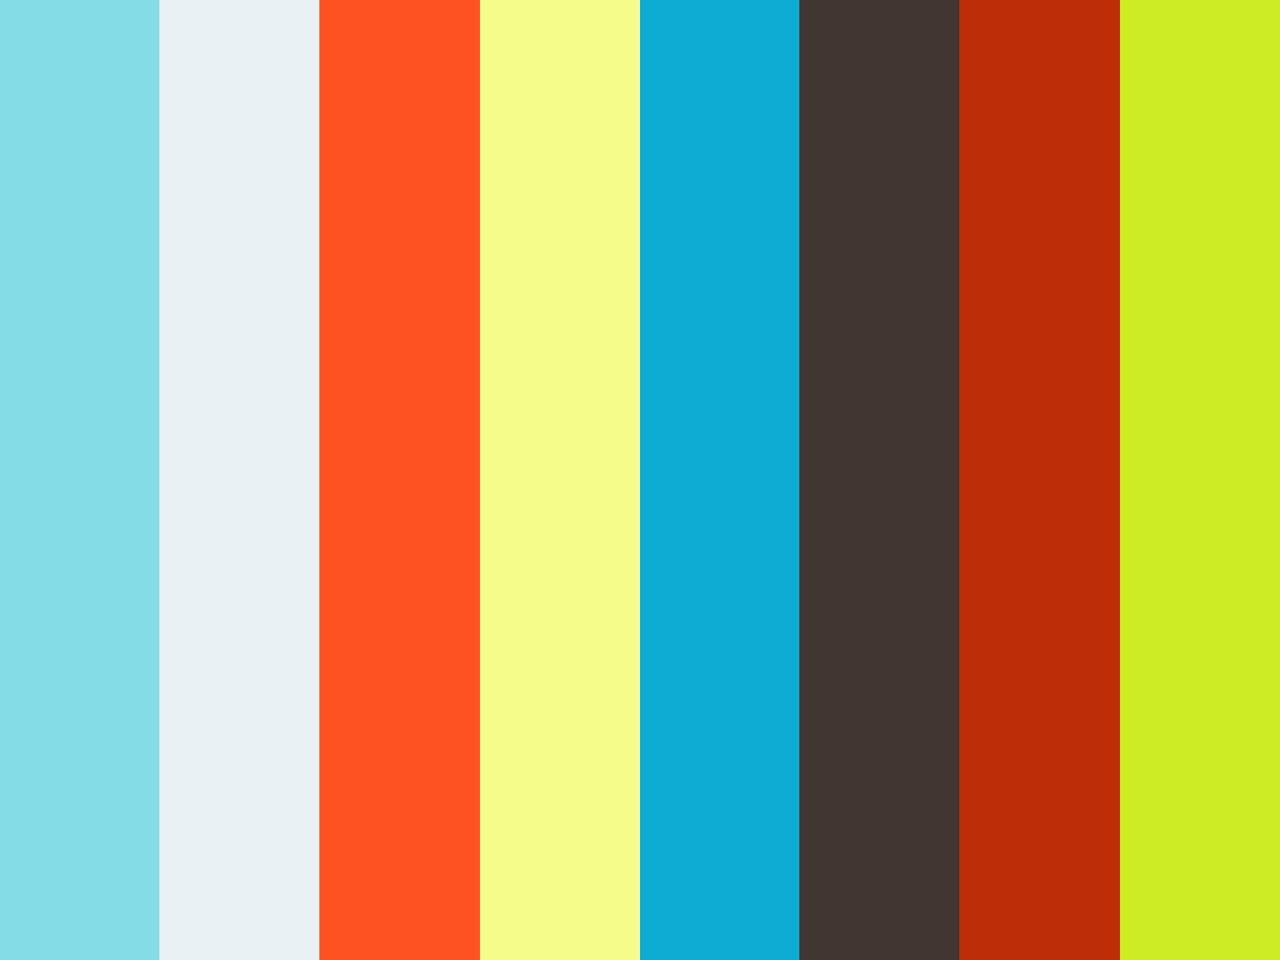 180824 | Magnus Myhr | I det fjerne, Troja